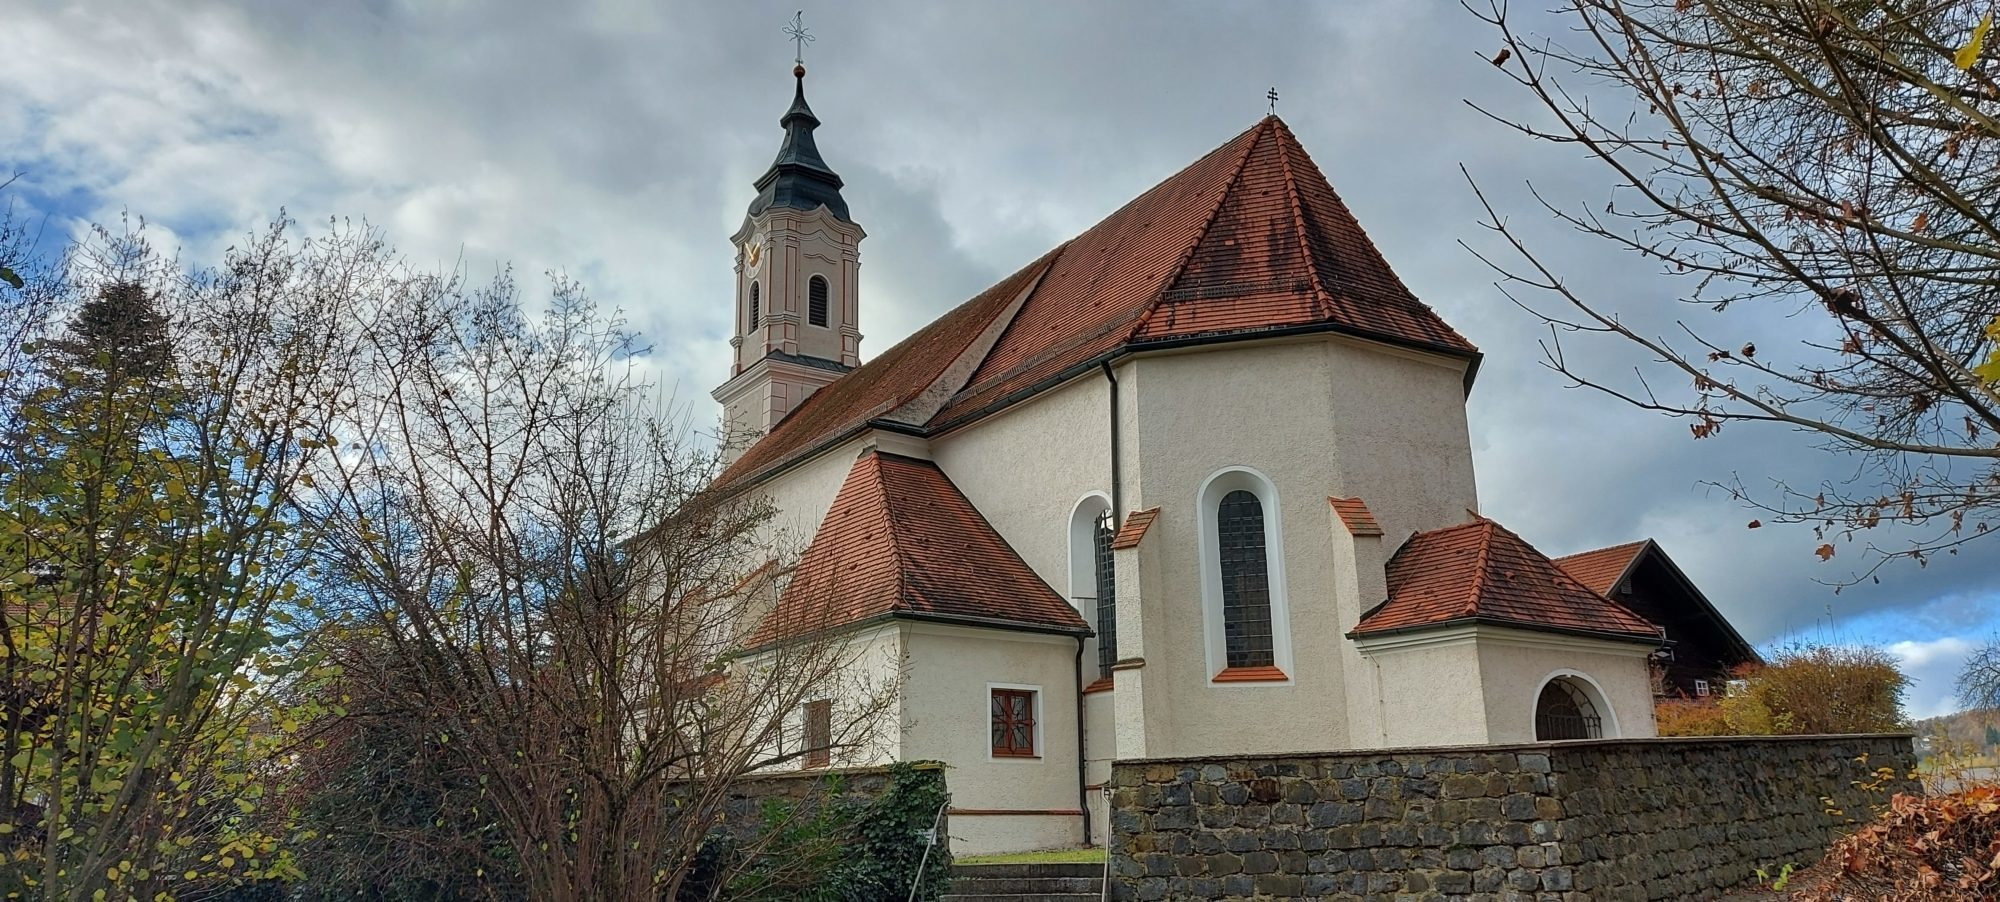 We St Wolfgang 16 11 20